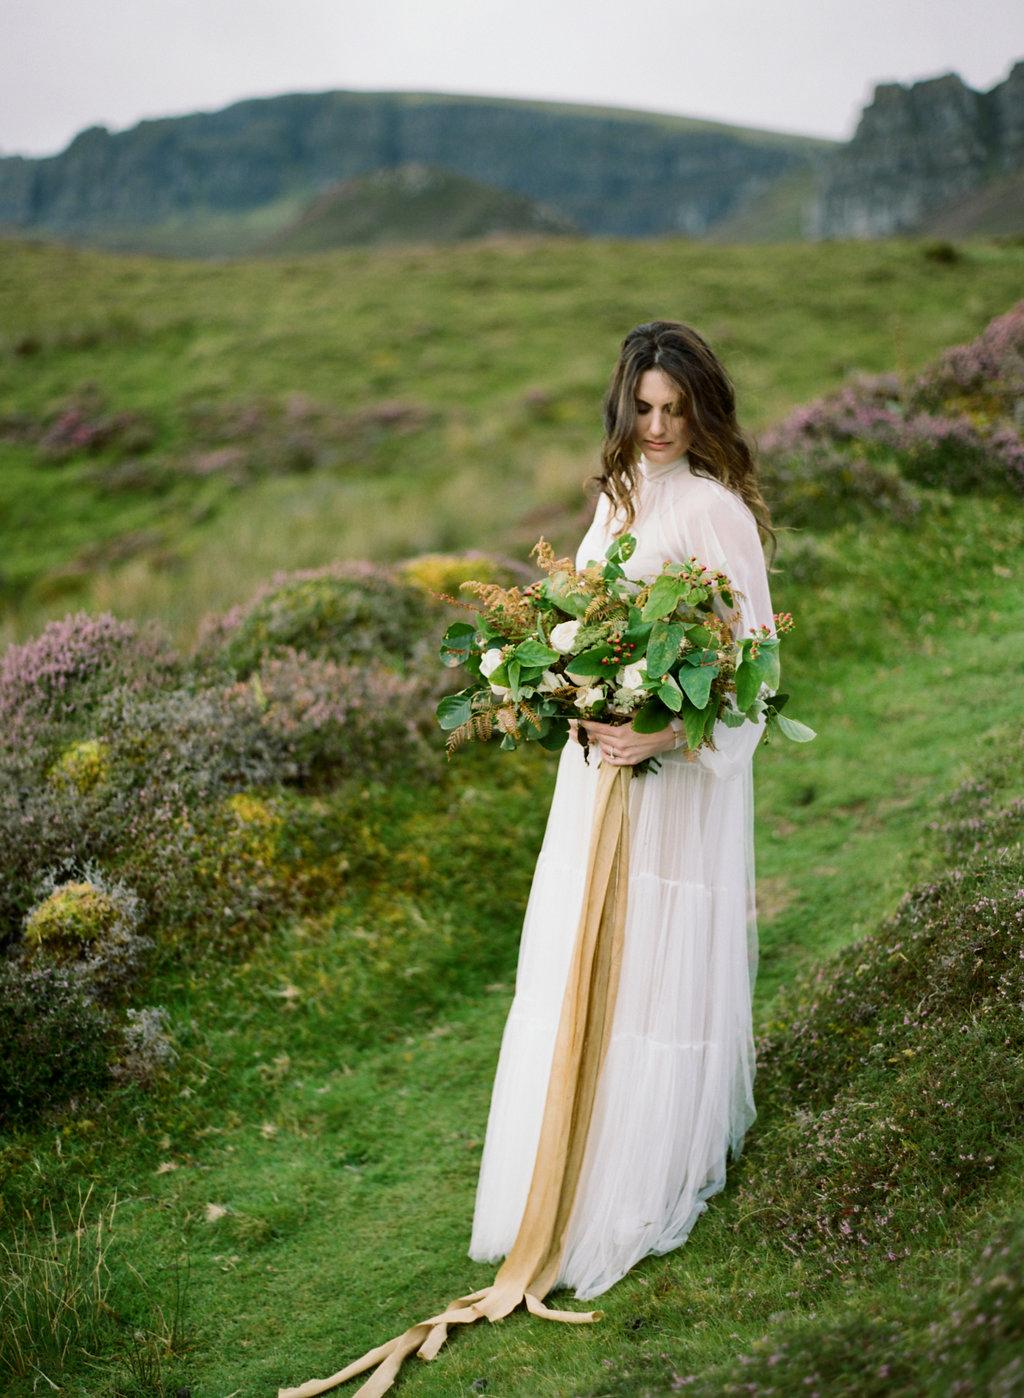 Scotland-Prewedding-highlands-castle-Engagment-Photos-Katie-Grant (14 of 139).jpg